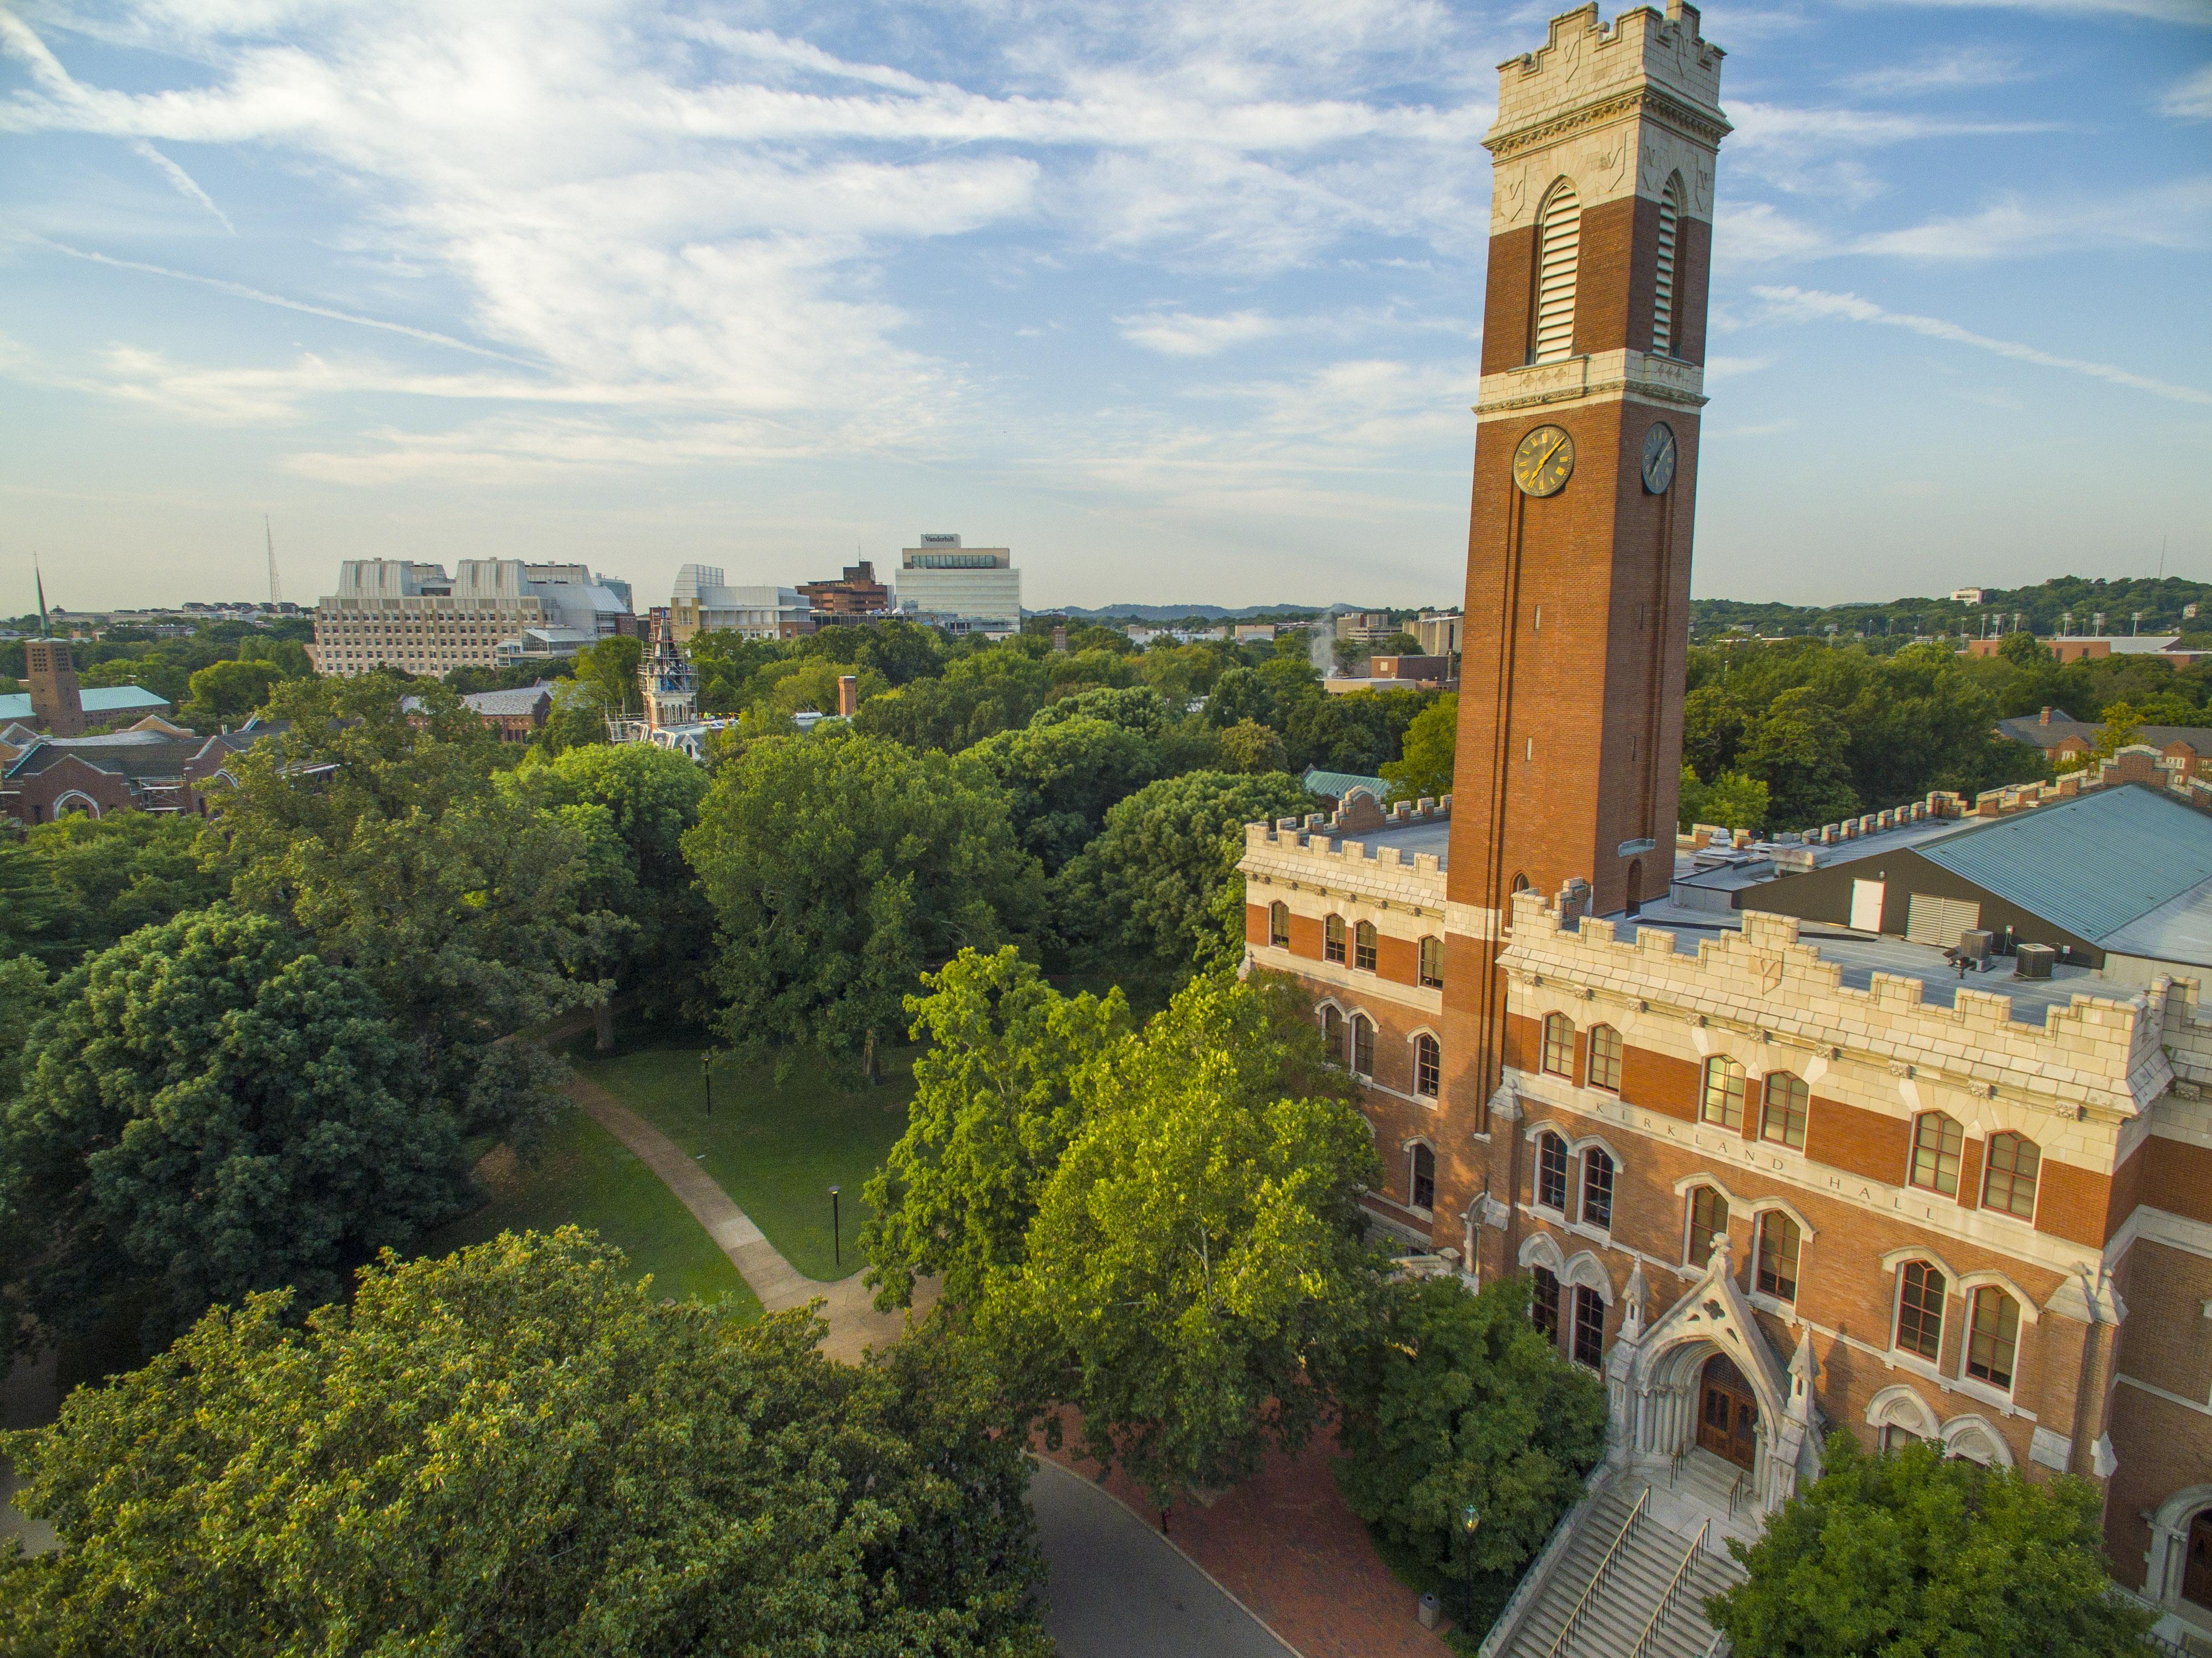 Aerial images of Vanderbilt Campus and Kirkland Hall (Daniel Dubois / Vanderbilt University)